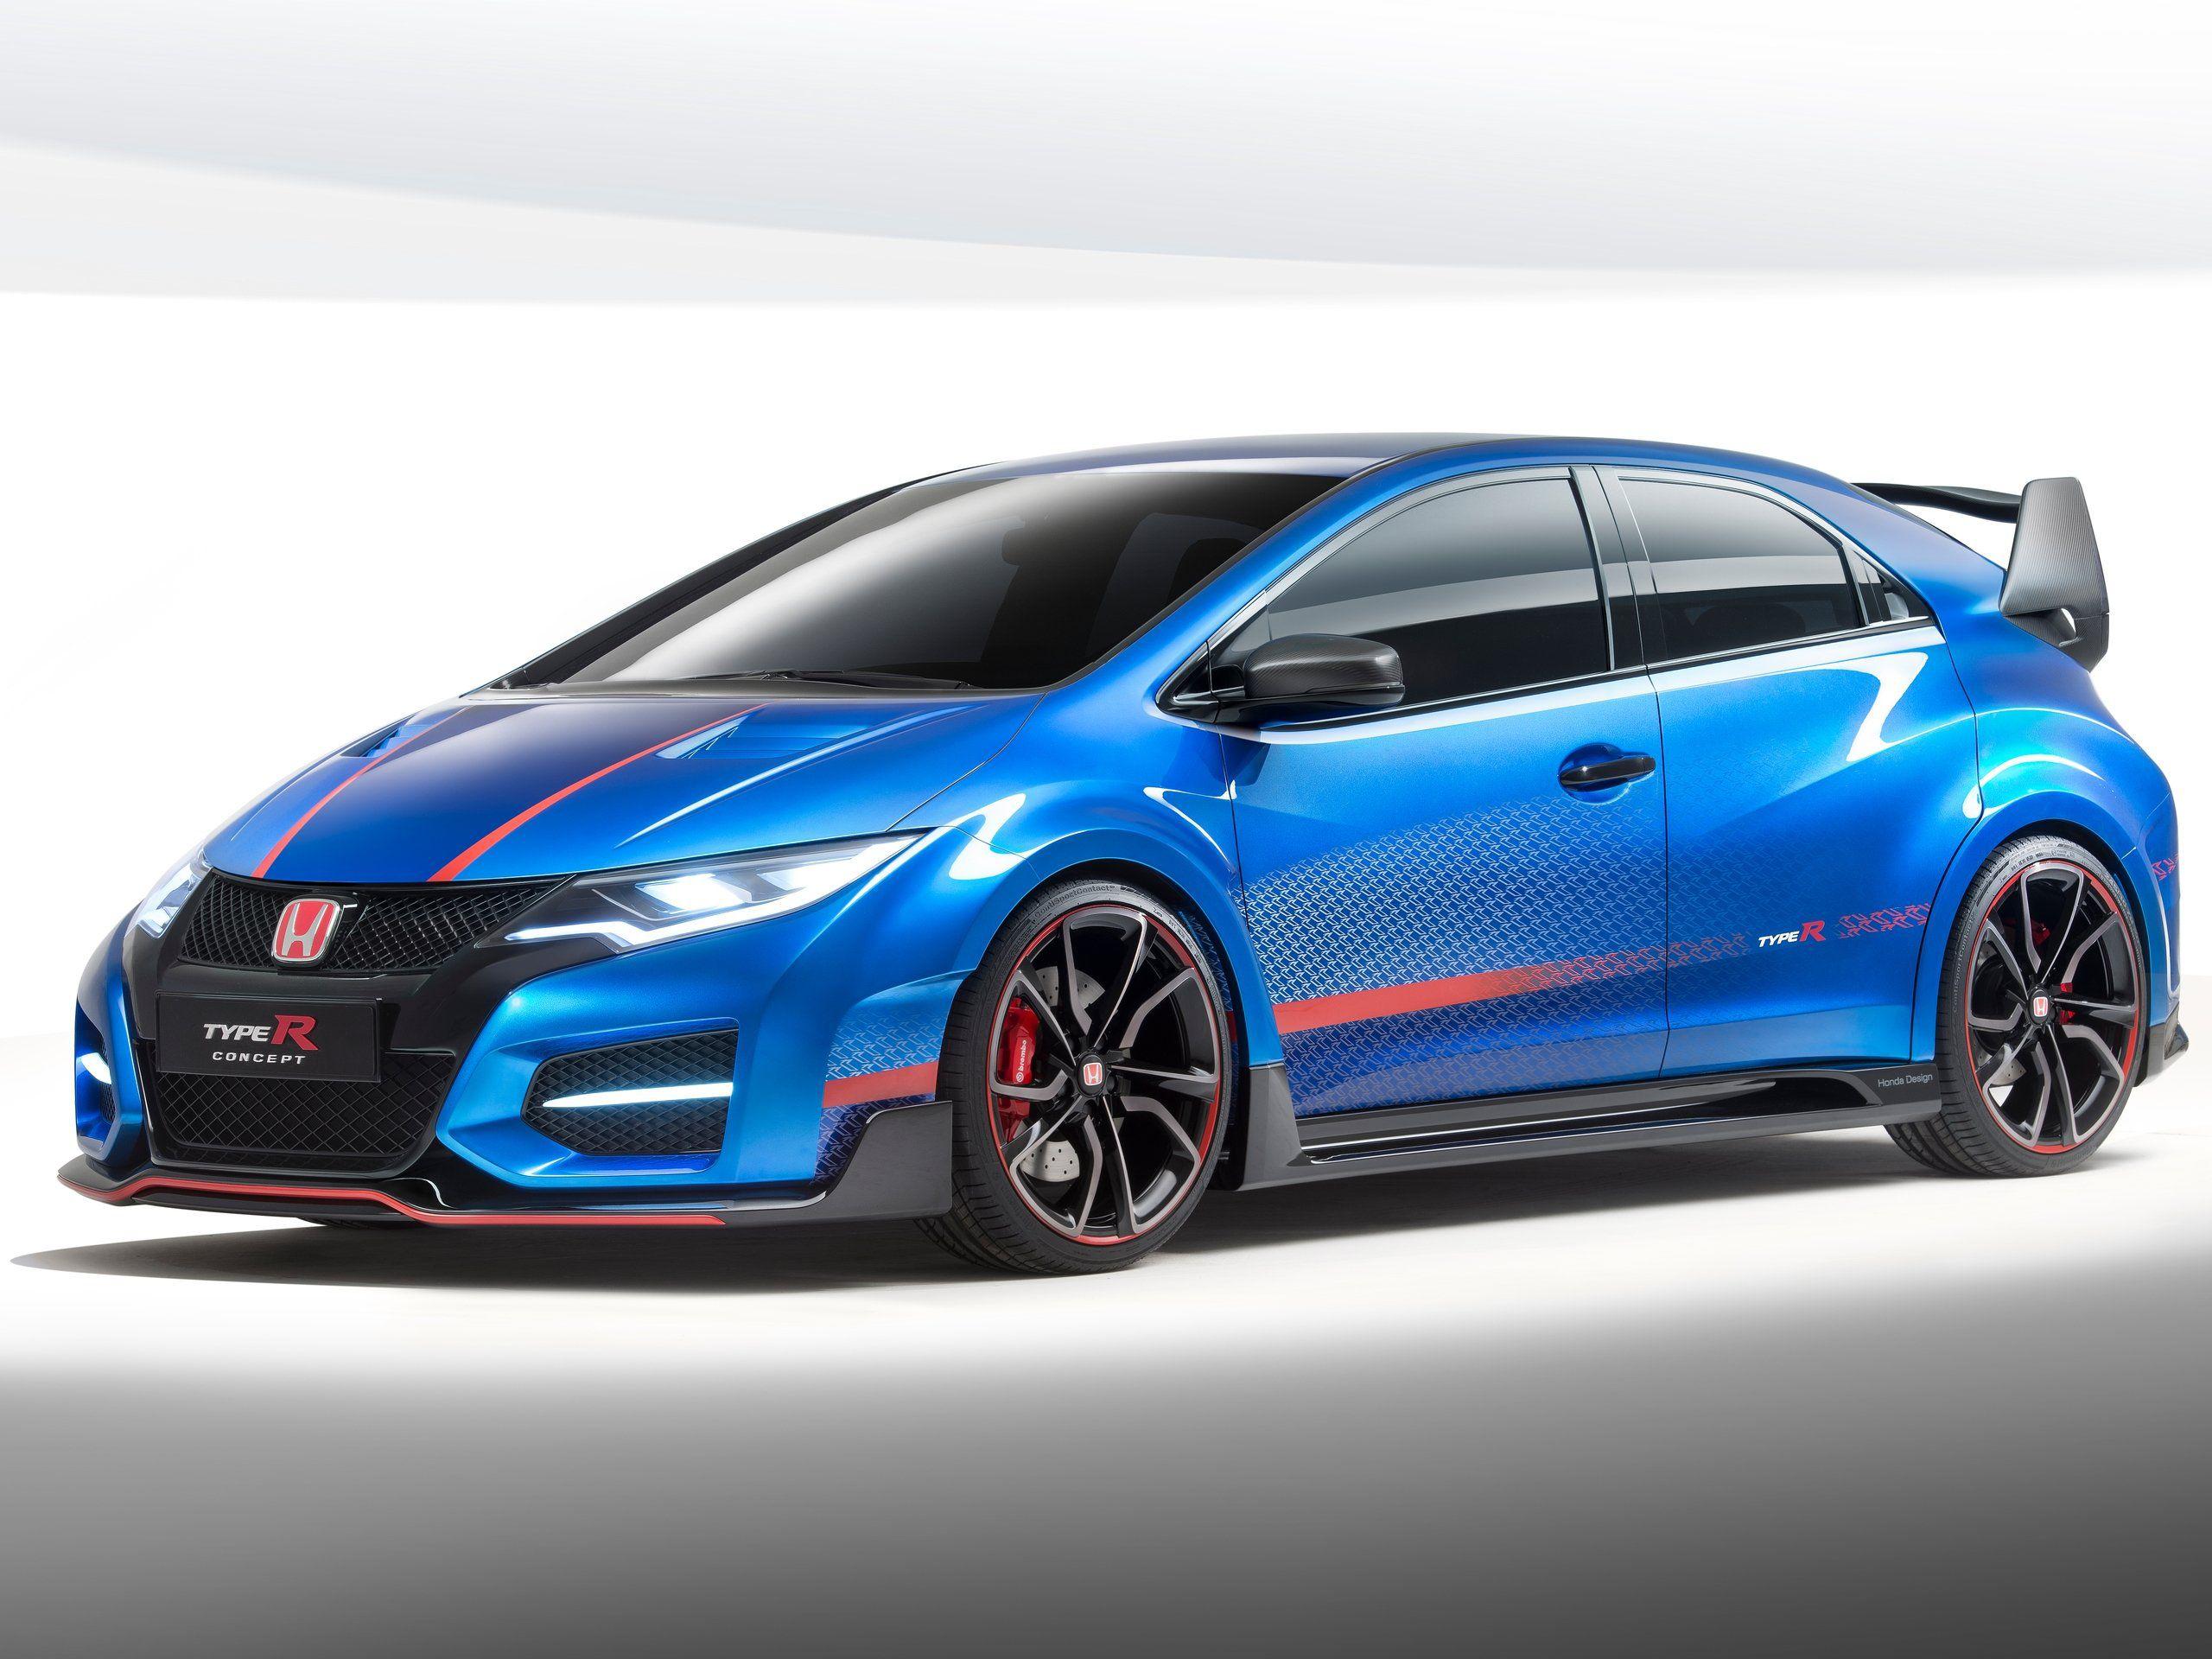 Honda Civic Type R 2015 Wallpaper Хонда сивик, Суперкары